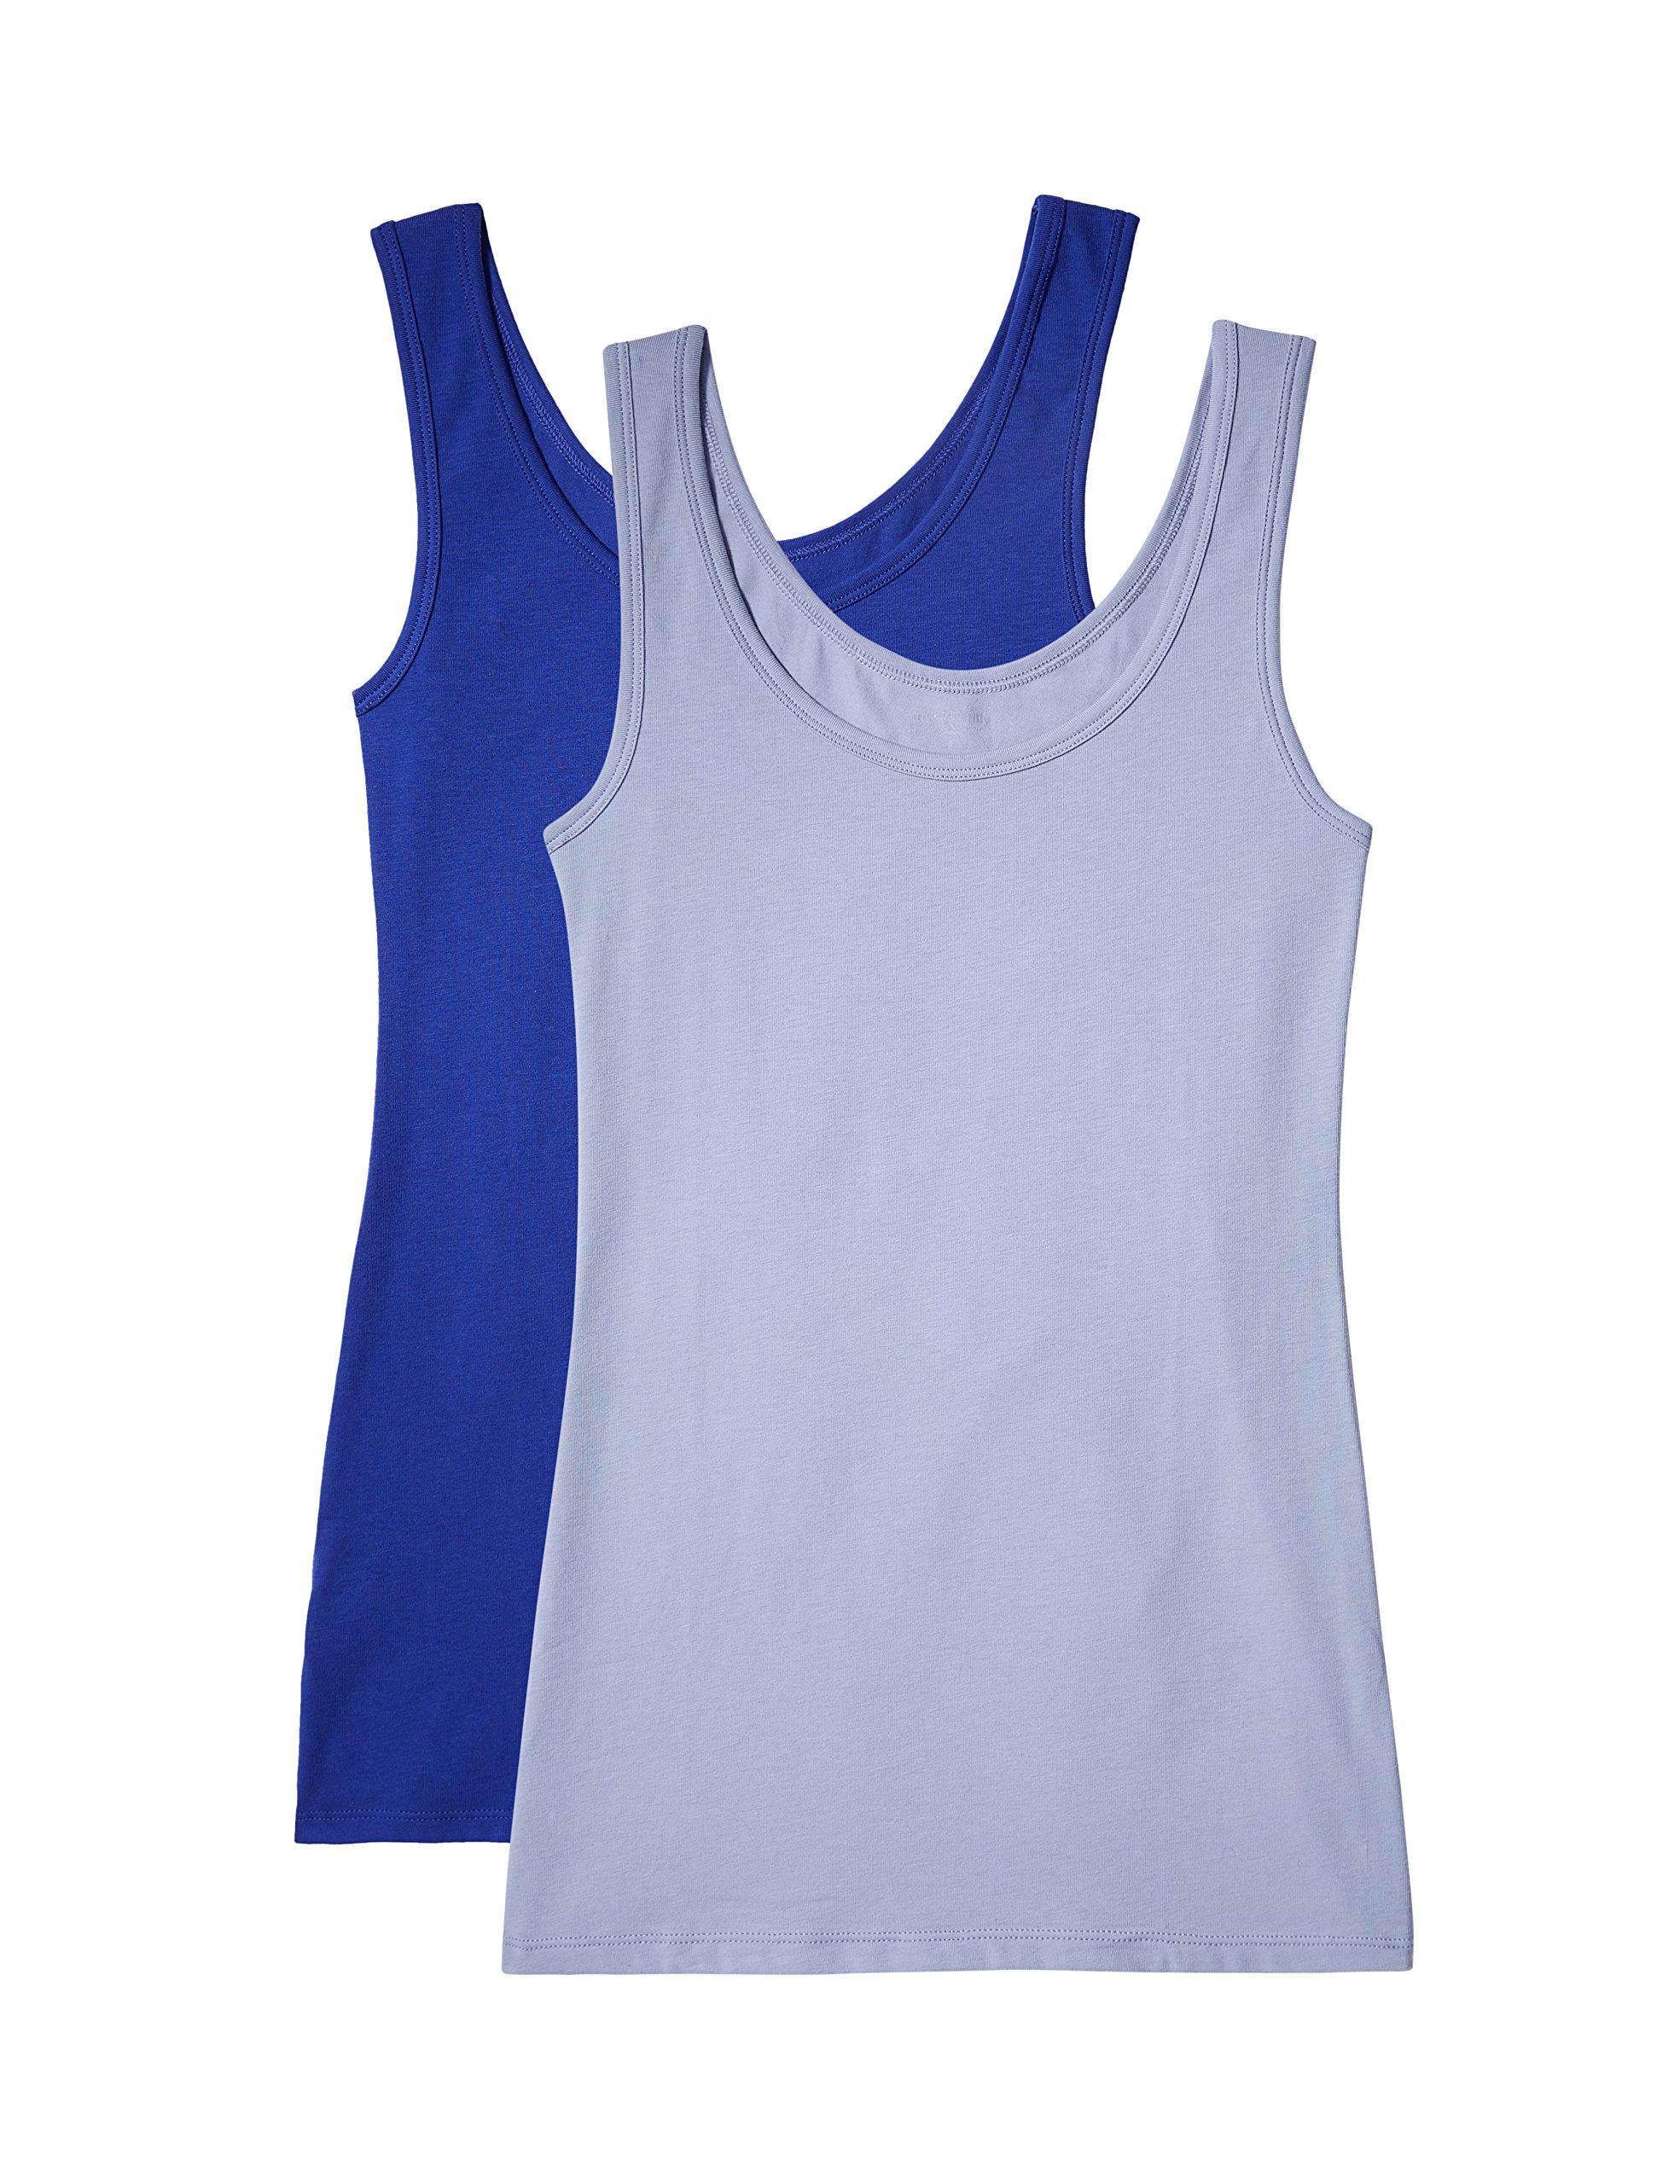 Marca Amazon – IRIS & LILLY Camiseta de Tirantes de Algodón para Mujer, Pack de 2